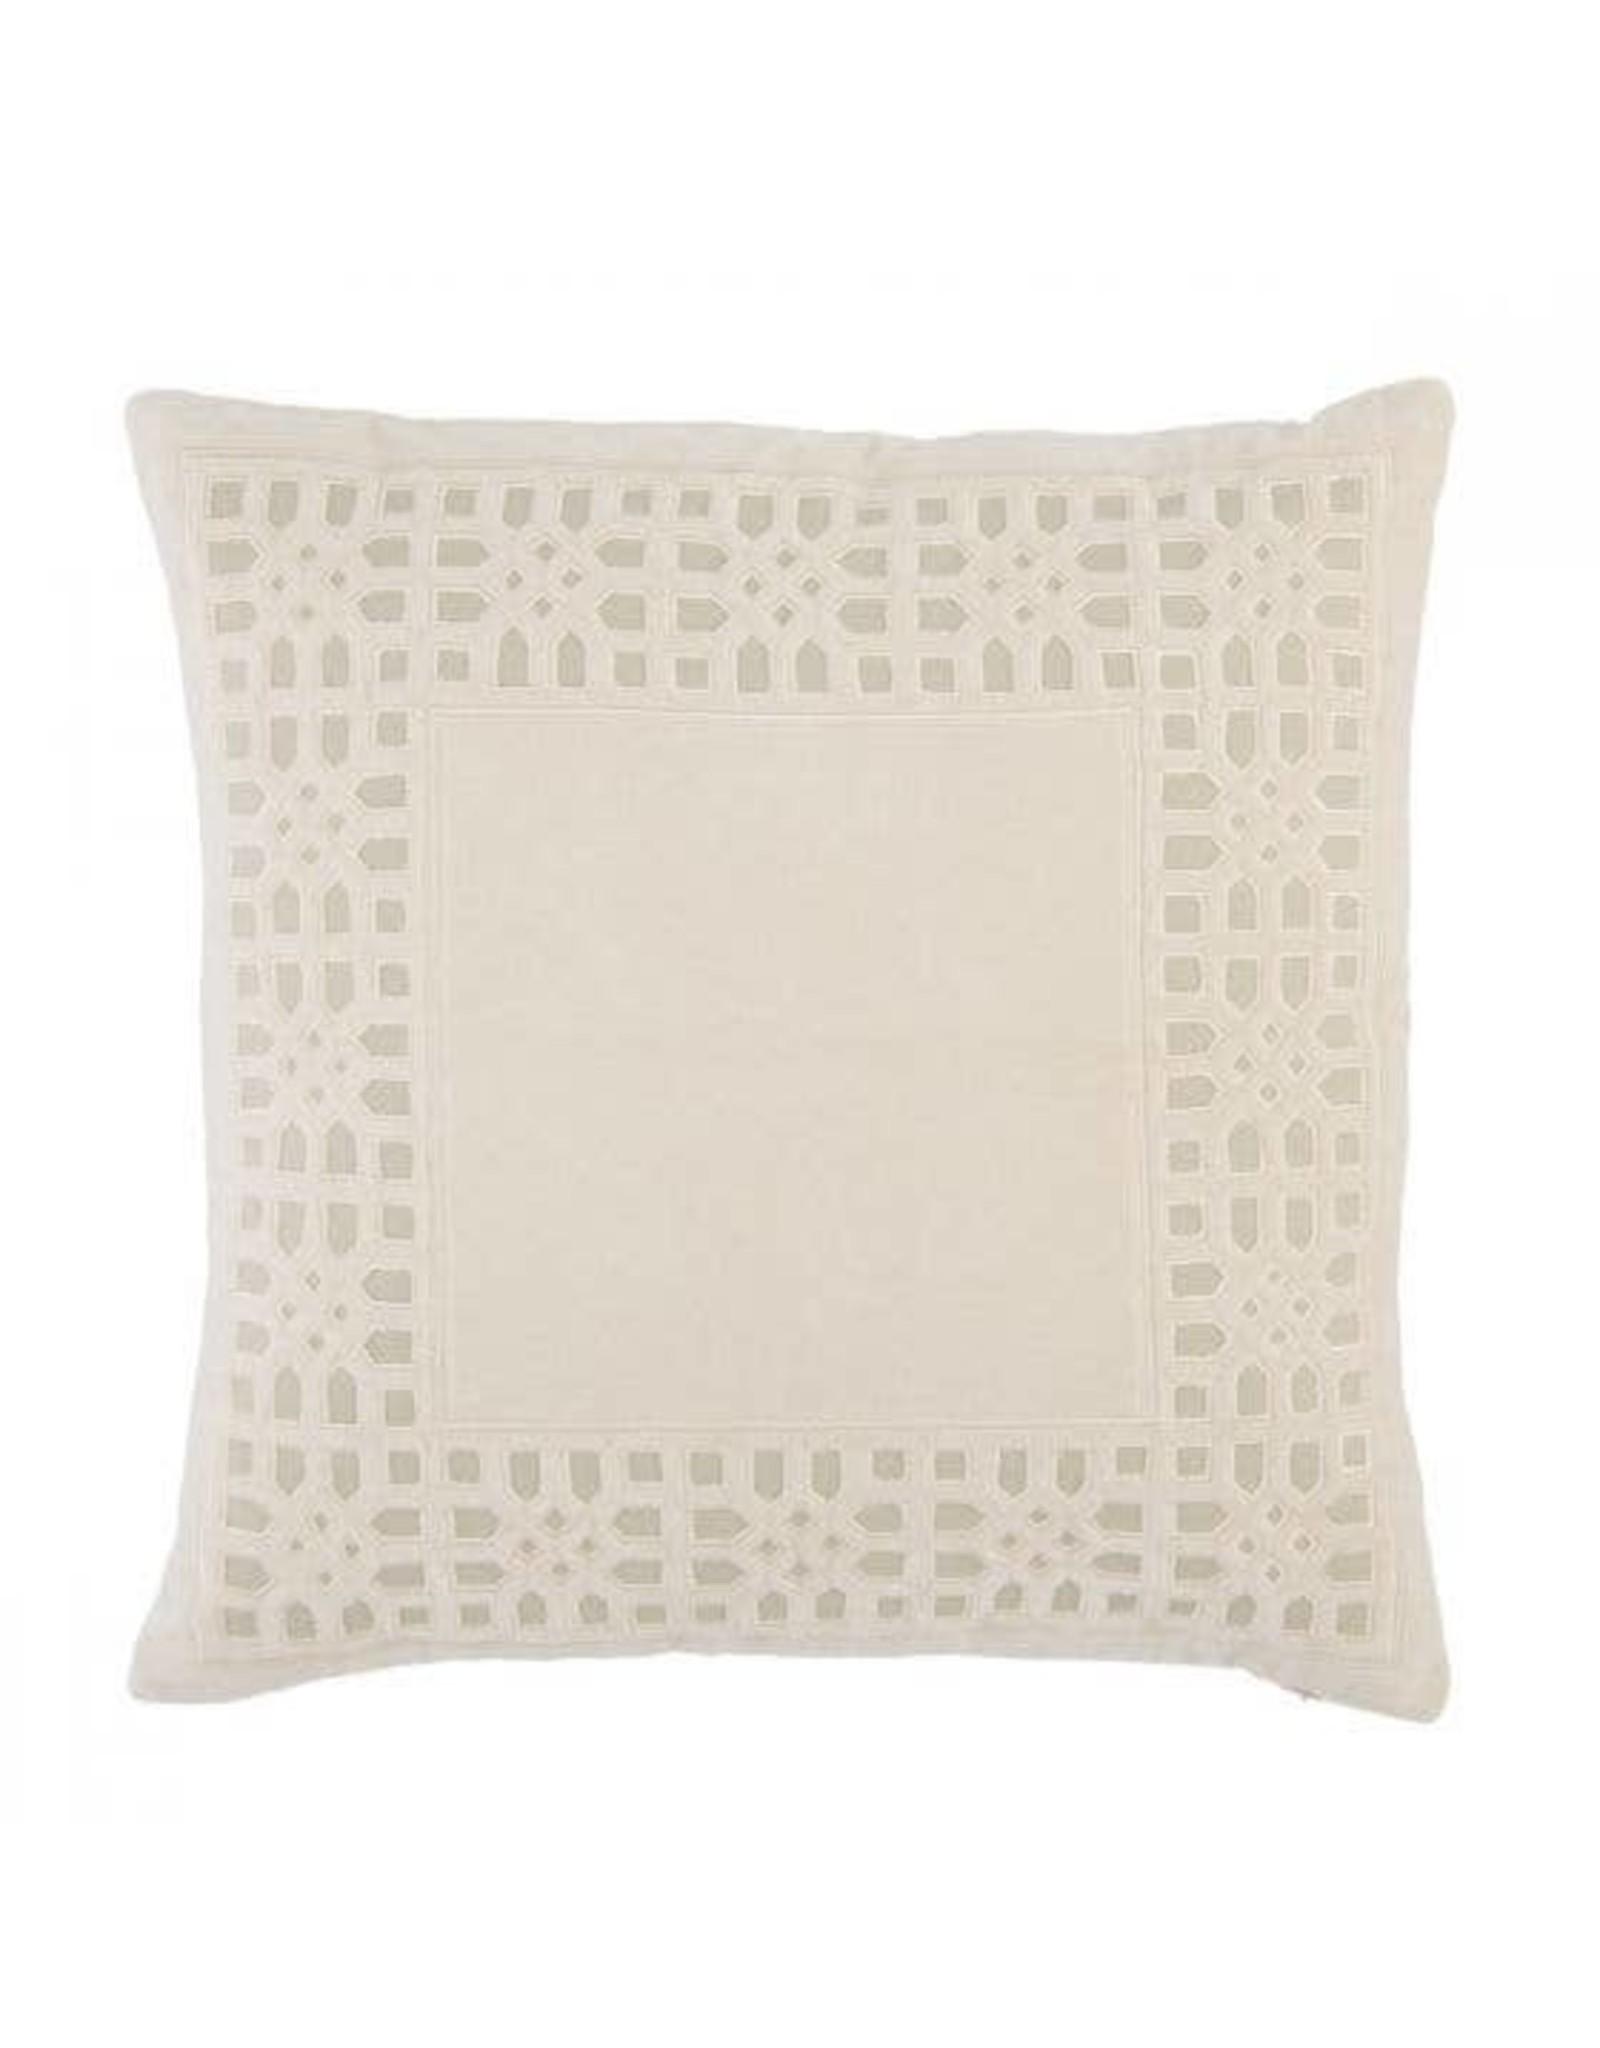 "Oak + Arrow Interiors Mezza Pillow Blush 22""x22"""